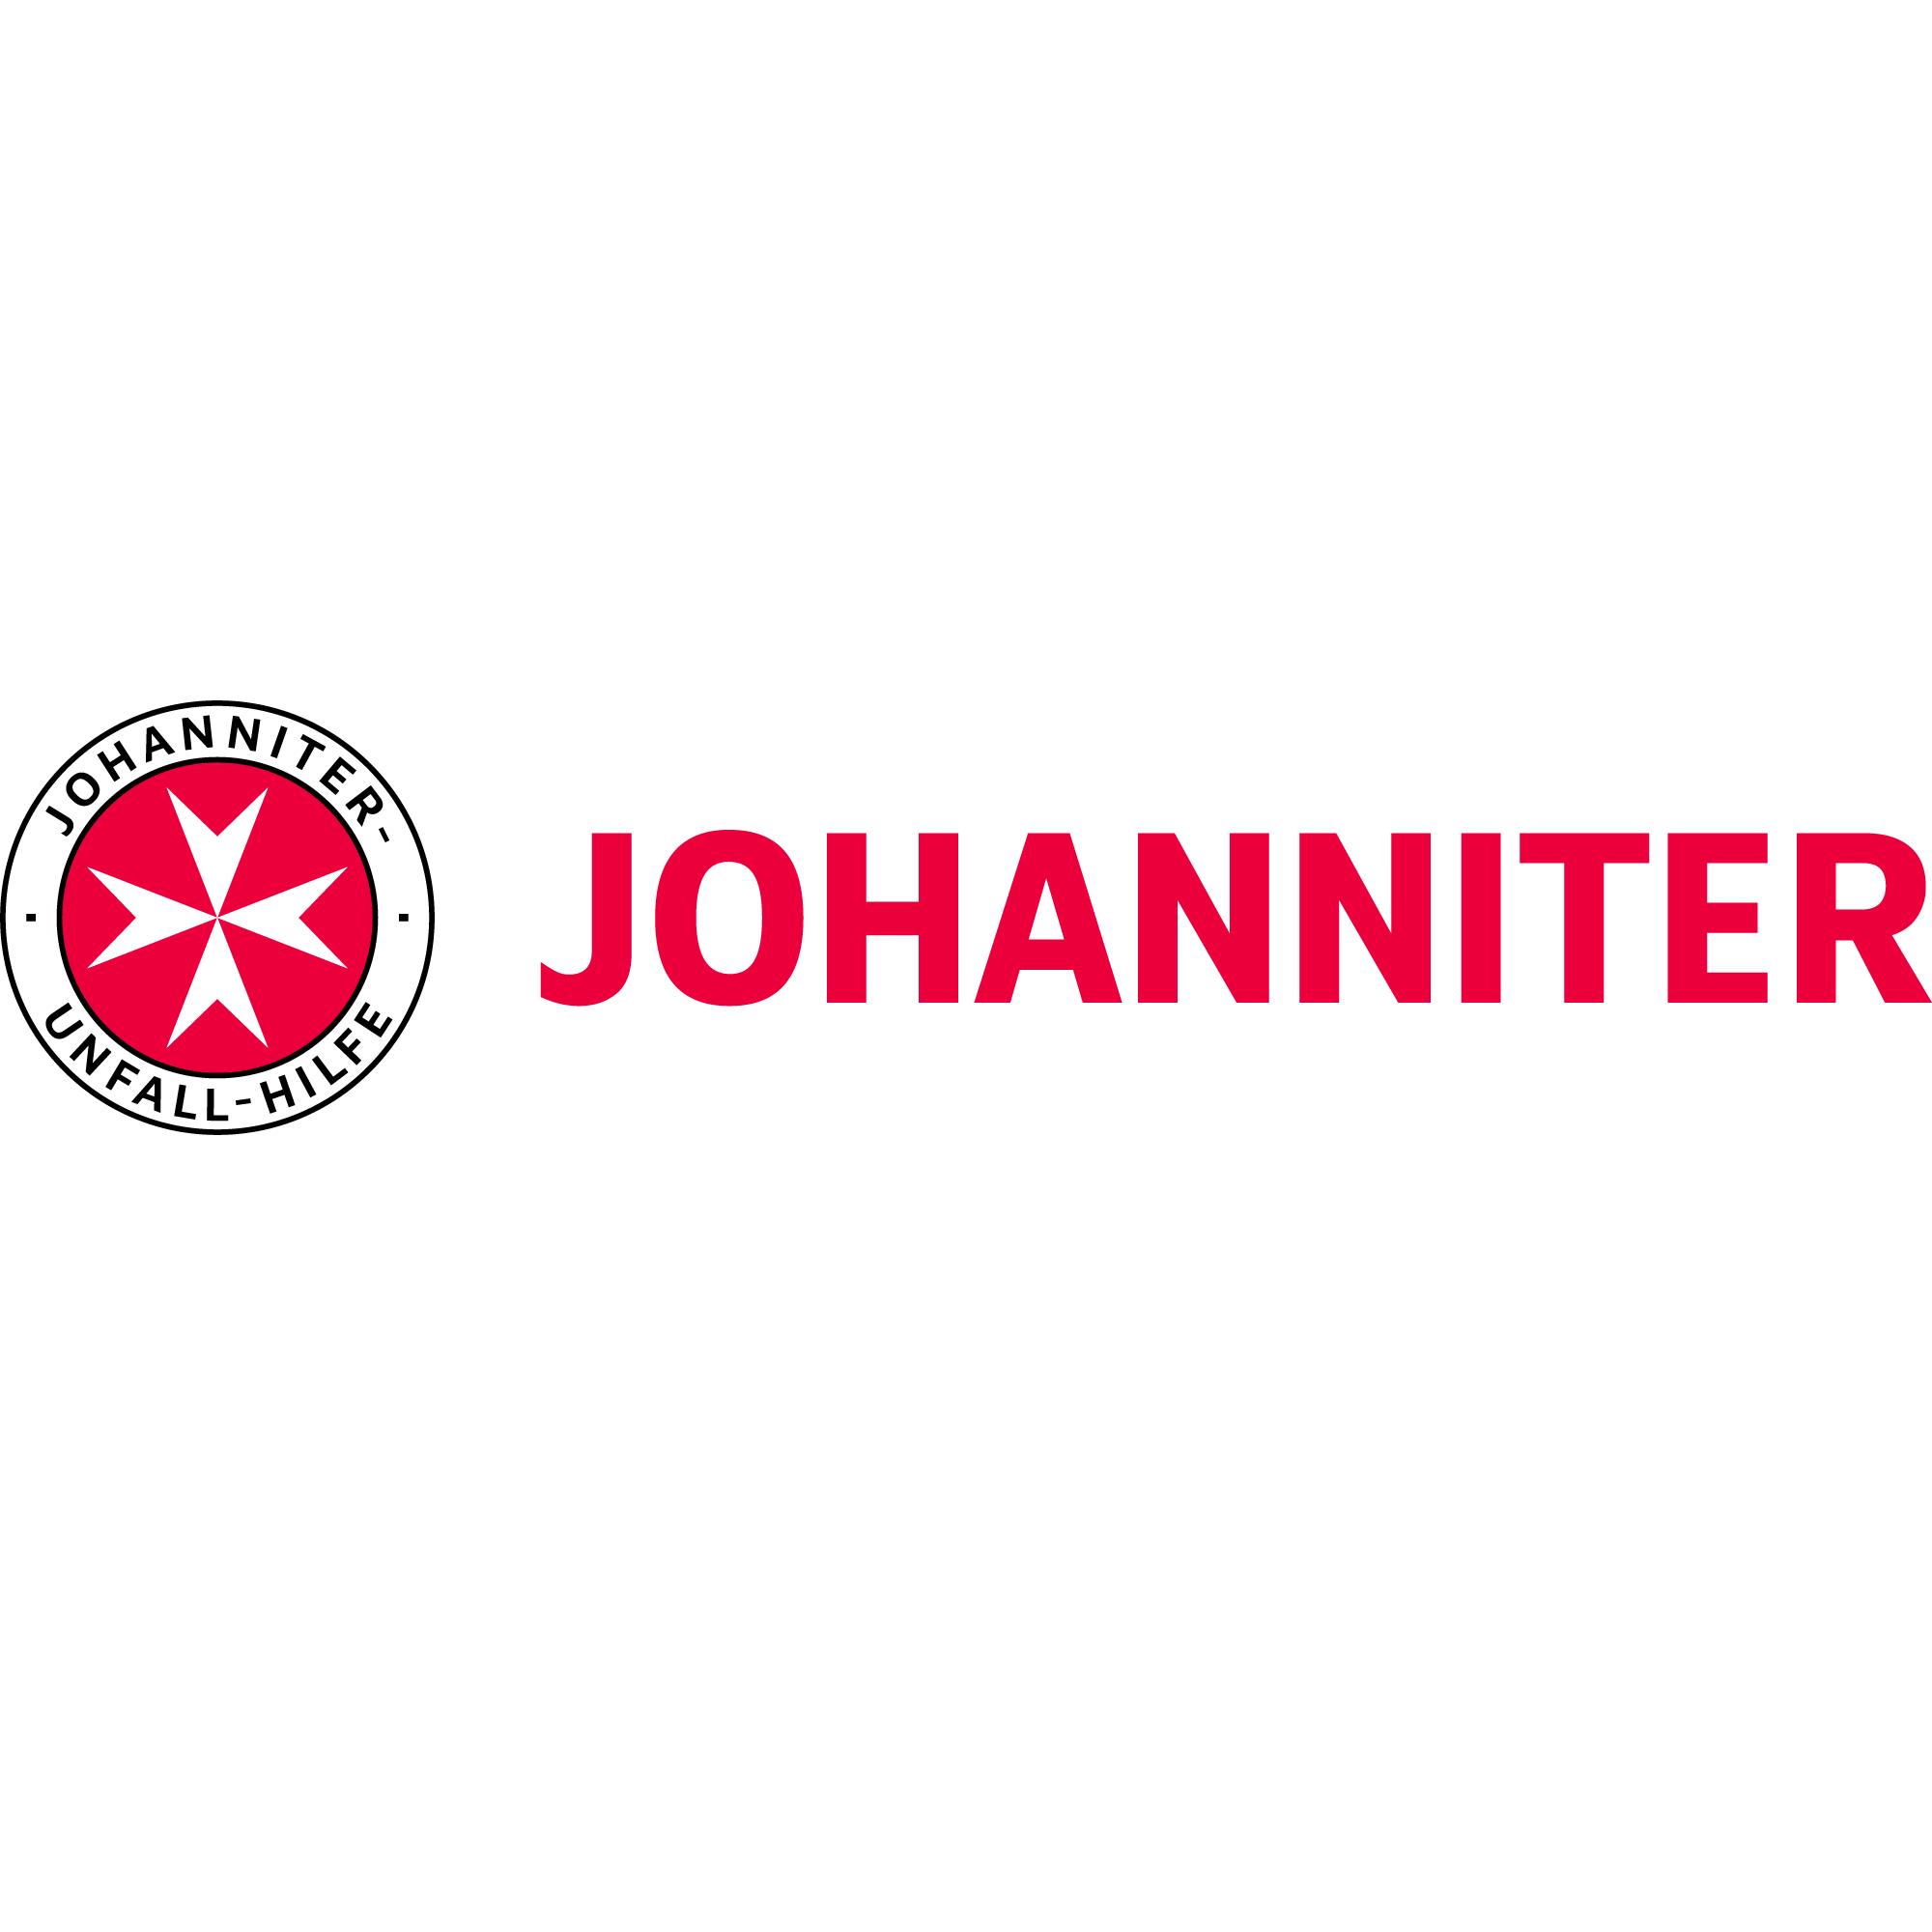 Johanniter-Unfall-Hilfe e.V. - Lilalu Bildungs- und Ferienprogramm